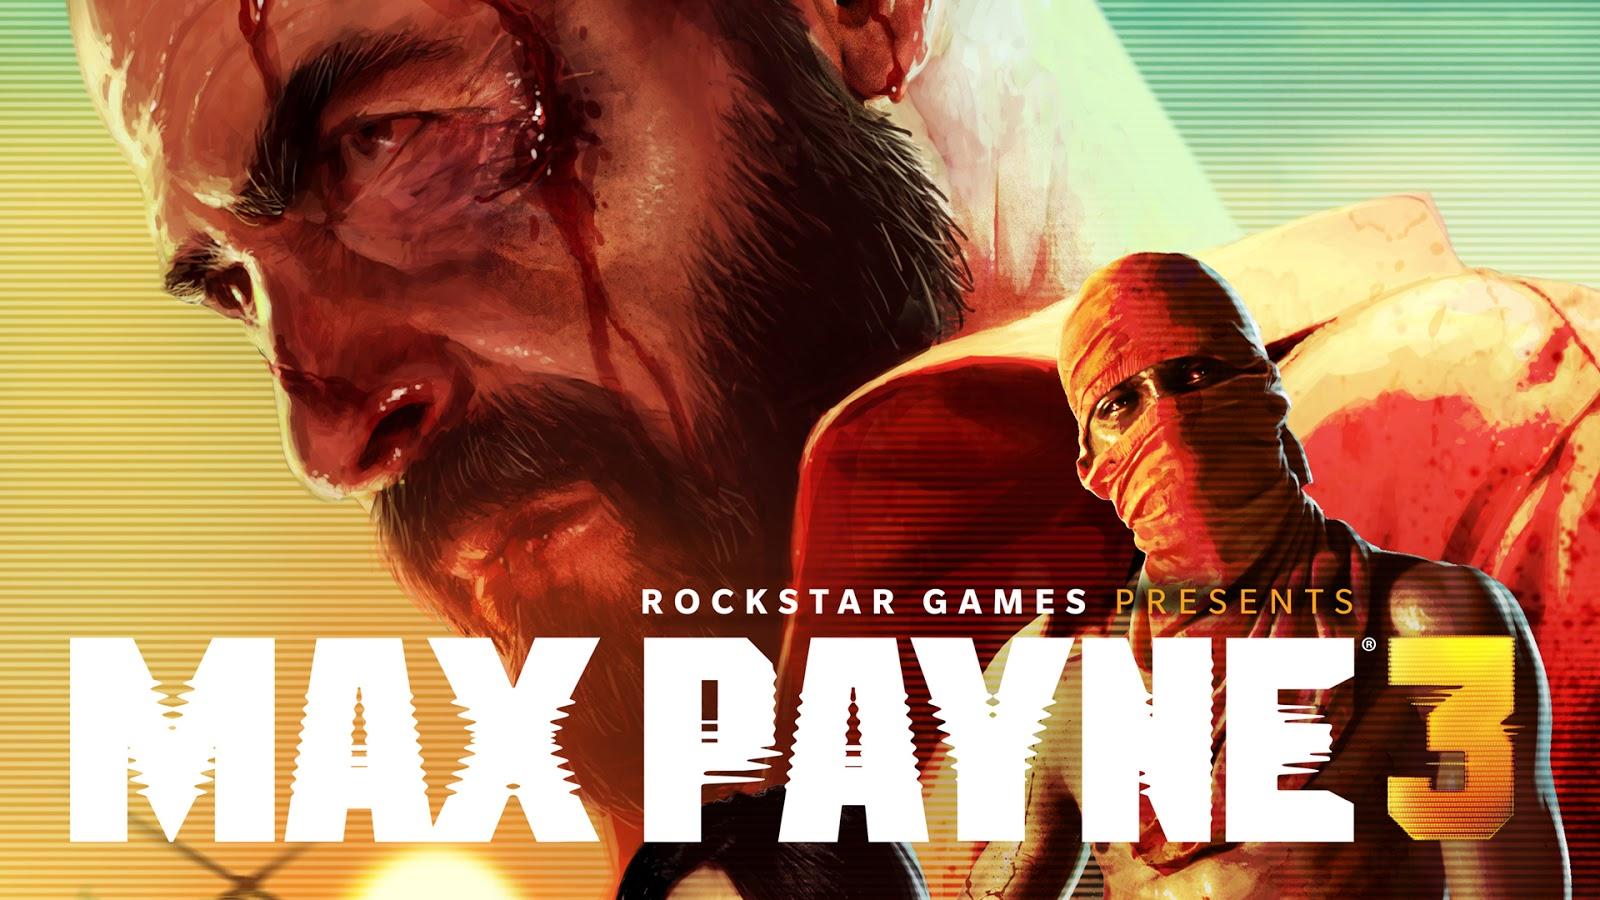 http://4.bp.blogspot.com/-kJ5-W3LguBU/TqVLTjDJerI/AAAAAAAADno/vF29IvhxLGc/s1600/Max_Payne_3_Rockstargames_Wallpaper_Vvallpaper.Net.jpg